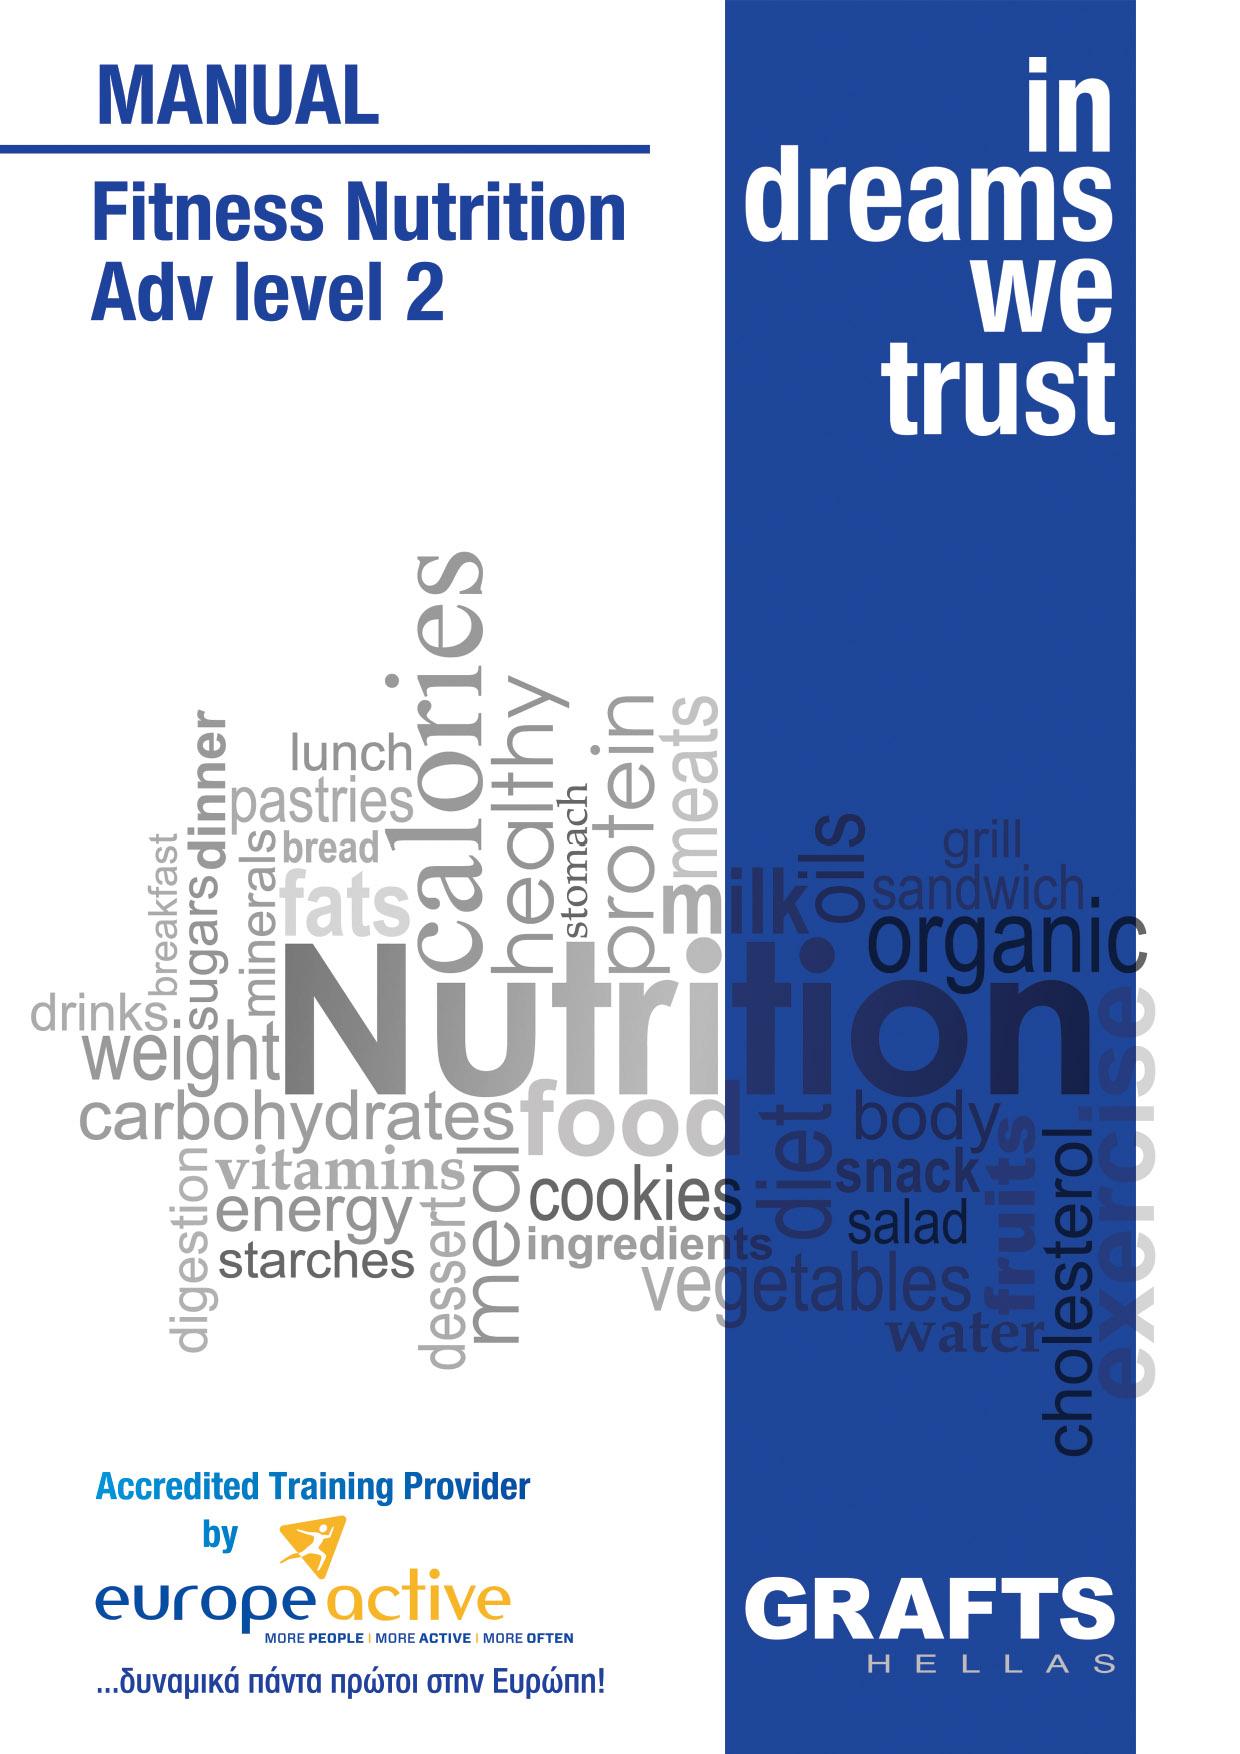 Grafts Hellas manual - Διατροφή Άσκηση και Υγεία - Adv Level 2